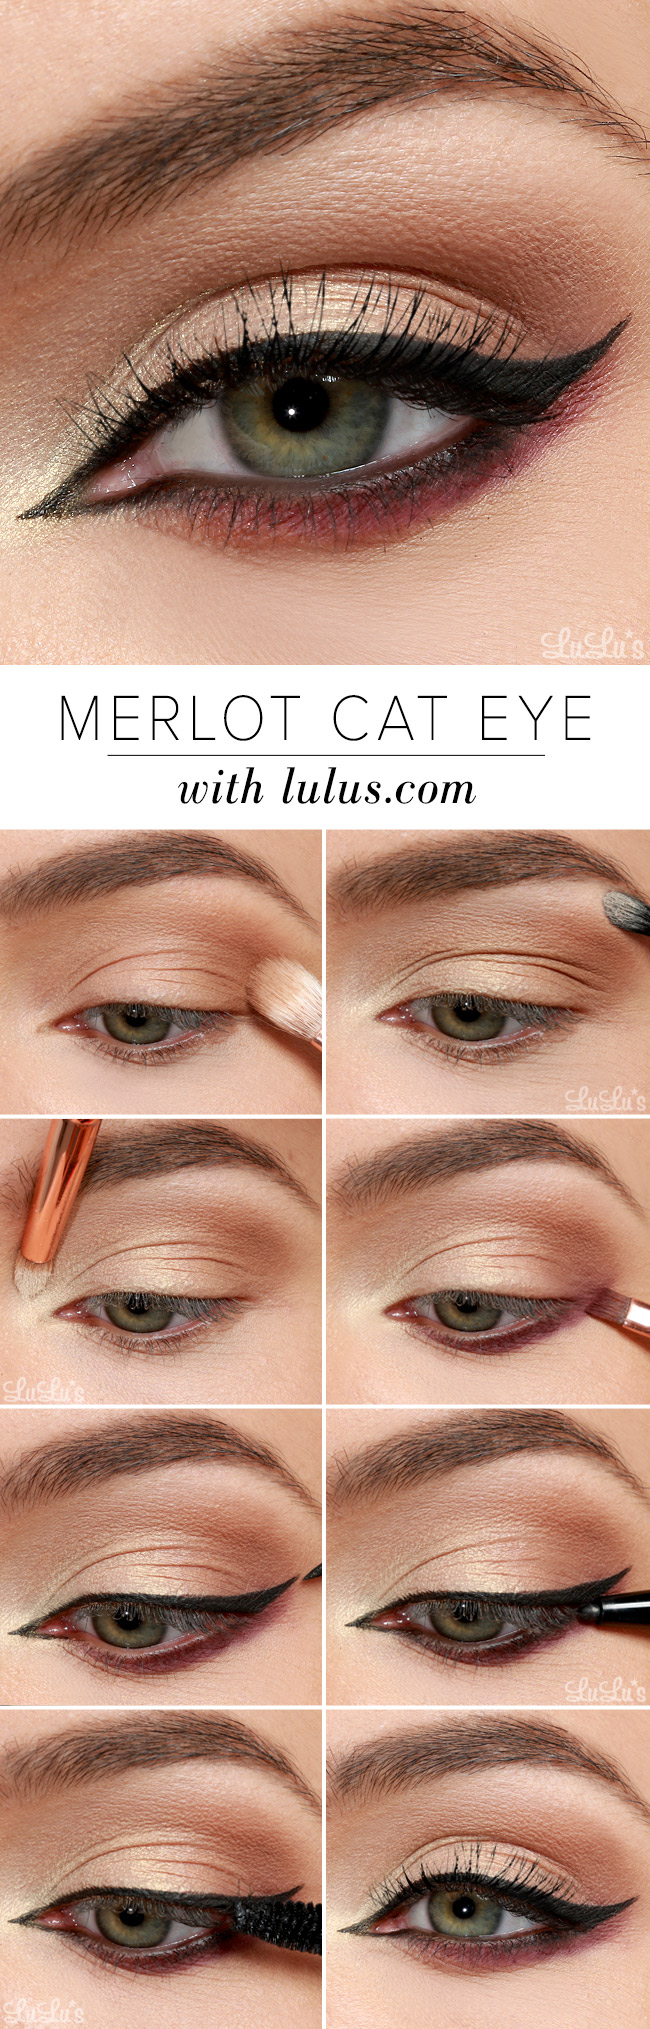 merlot cat eye